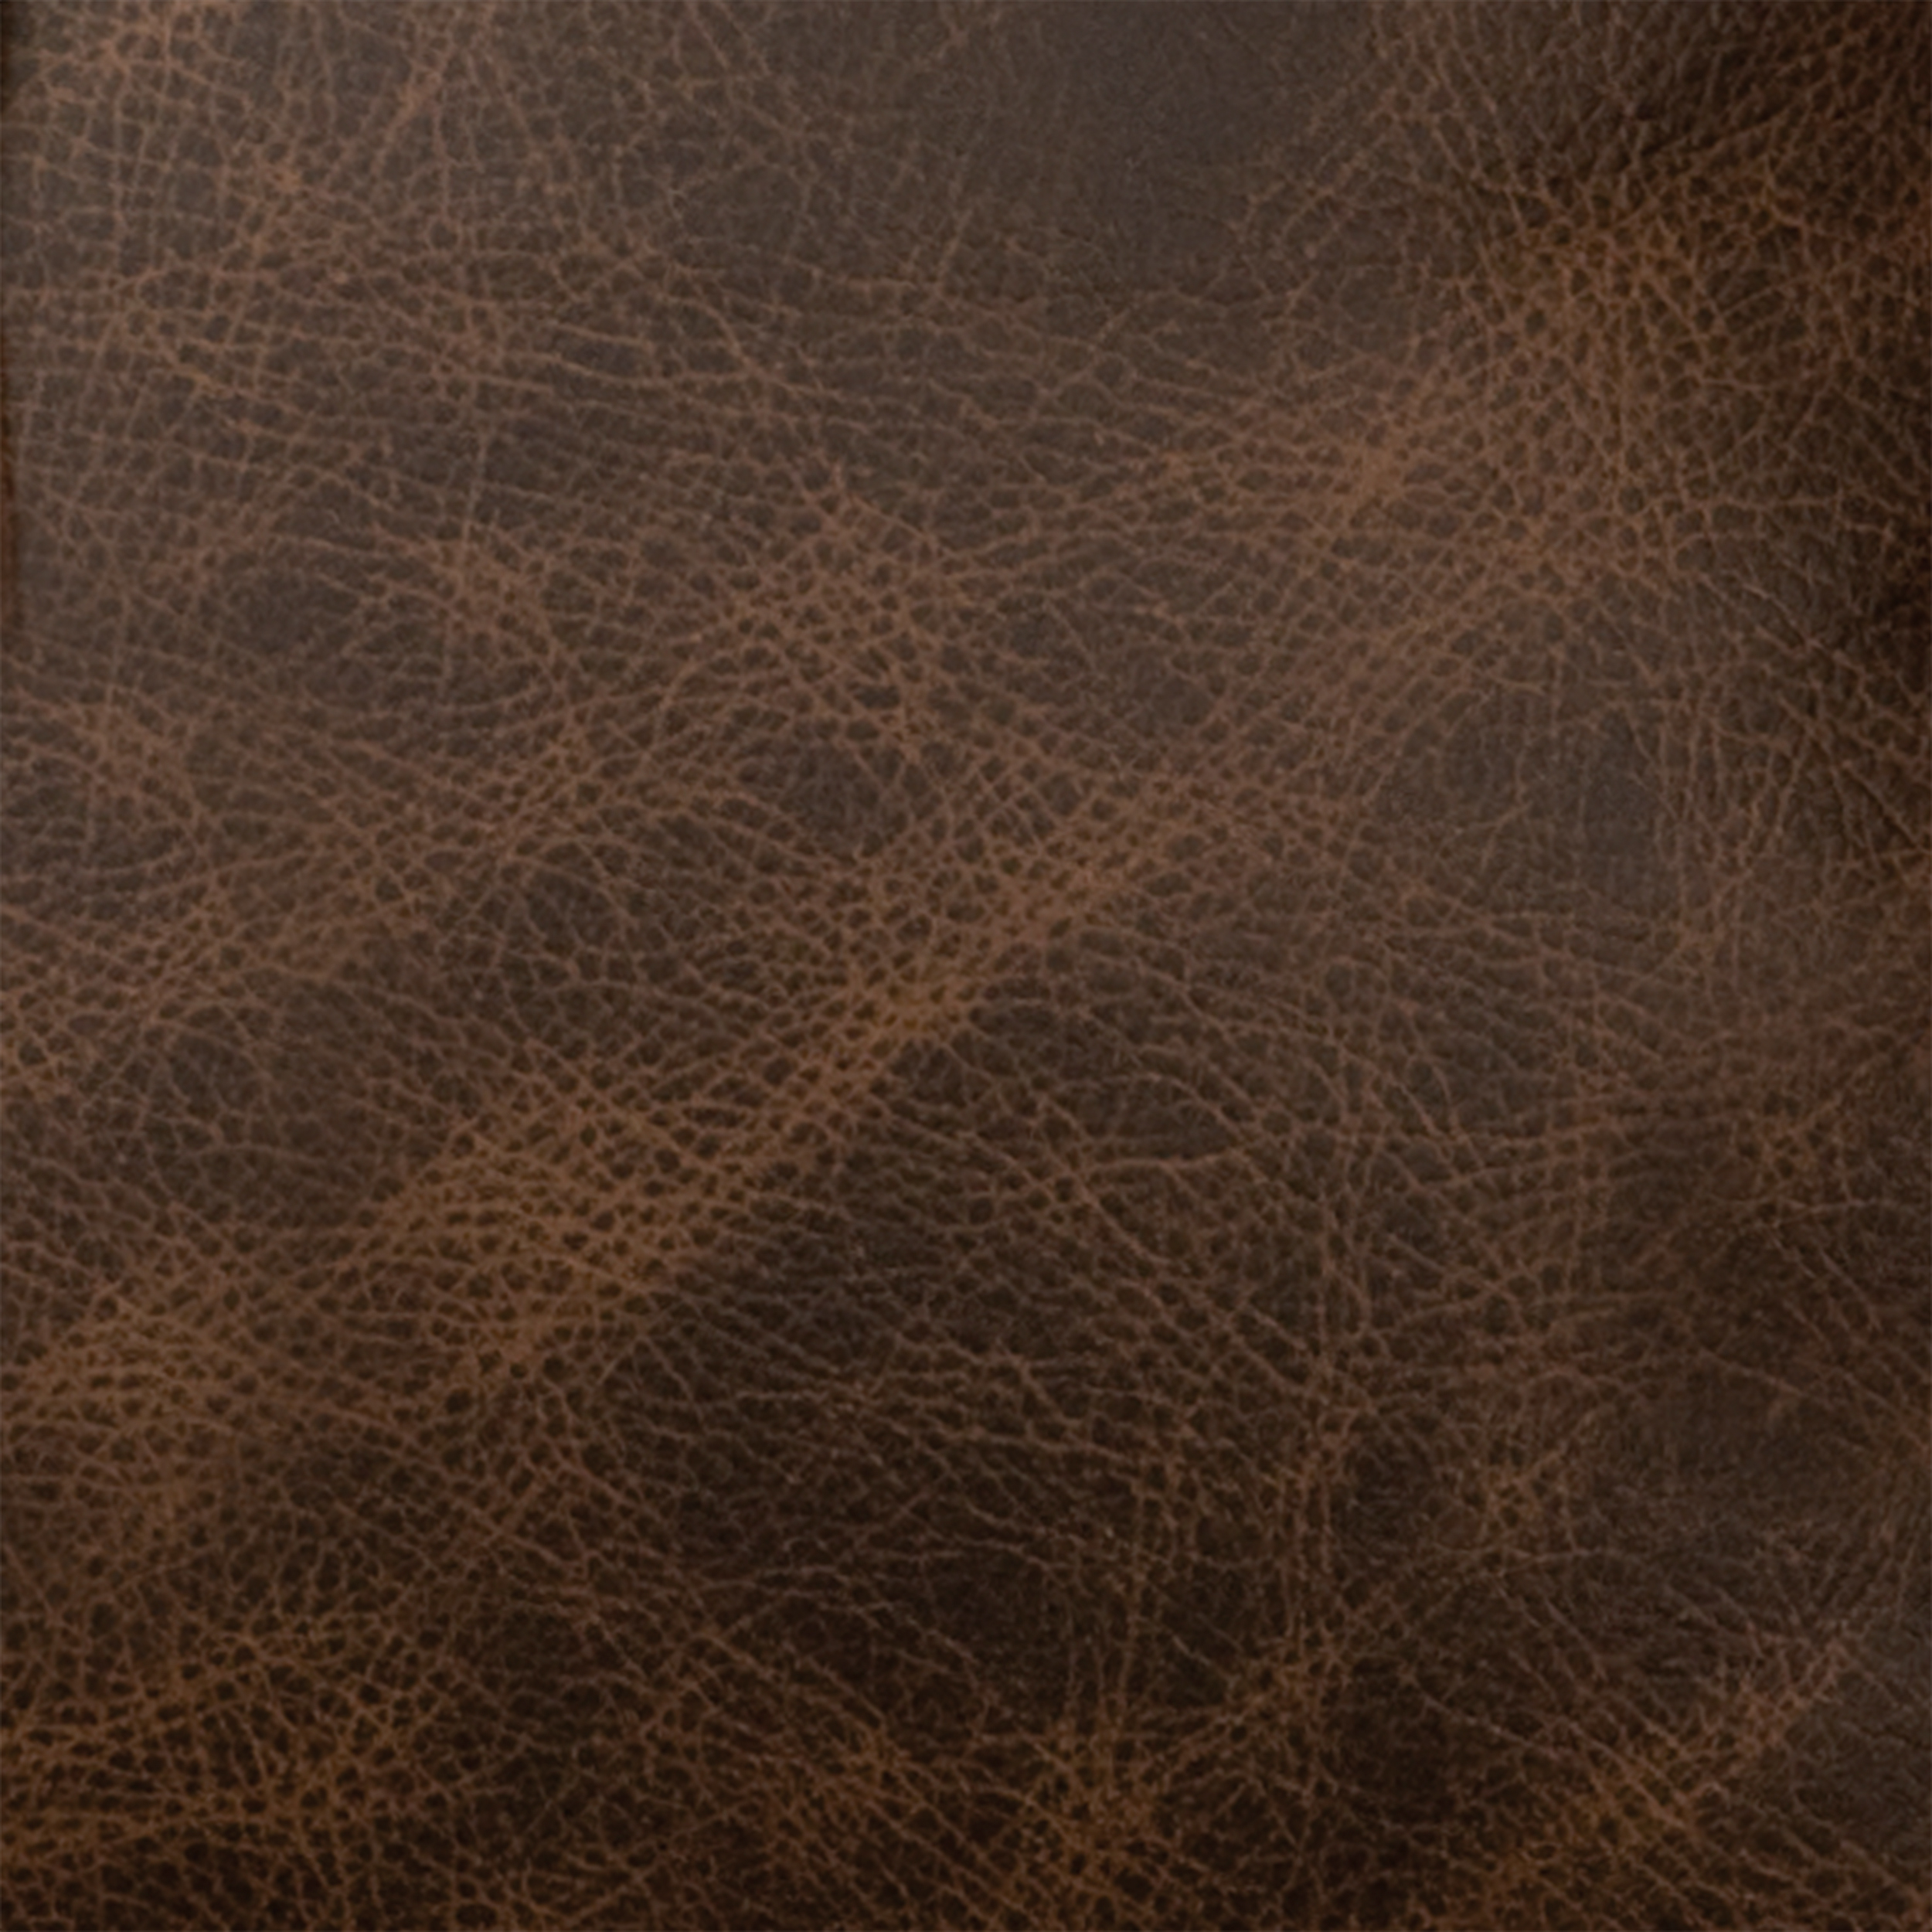 Texas Leather